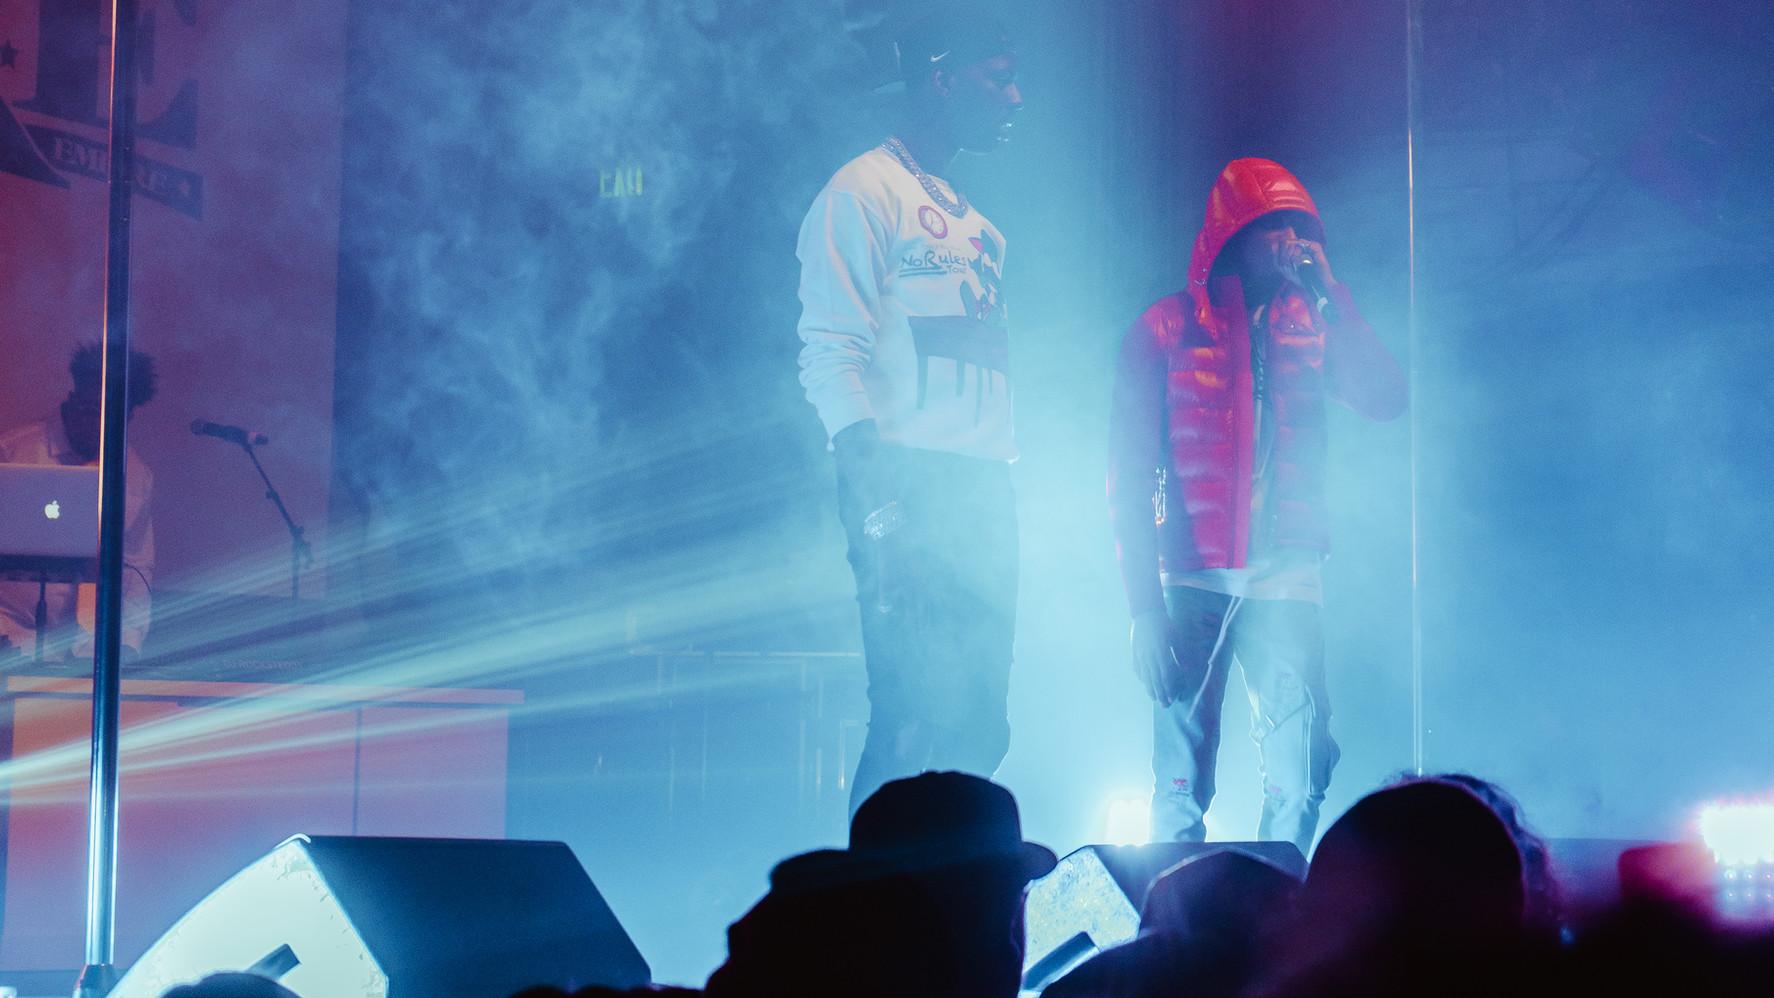 2.8.2020 Young Dolph & Key Glock | Regency Ballroom, SF, CA Photographer: Izak Ramos - Goldenvoice